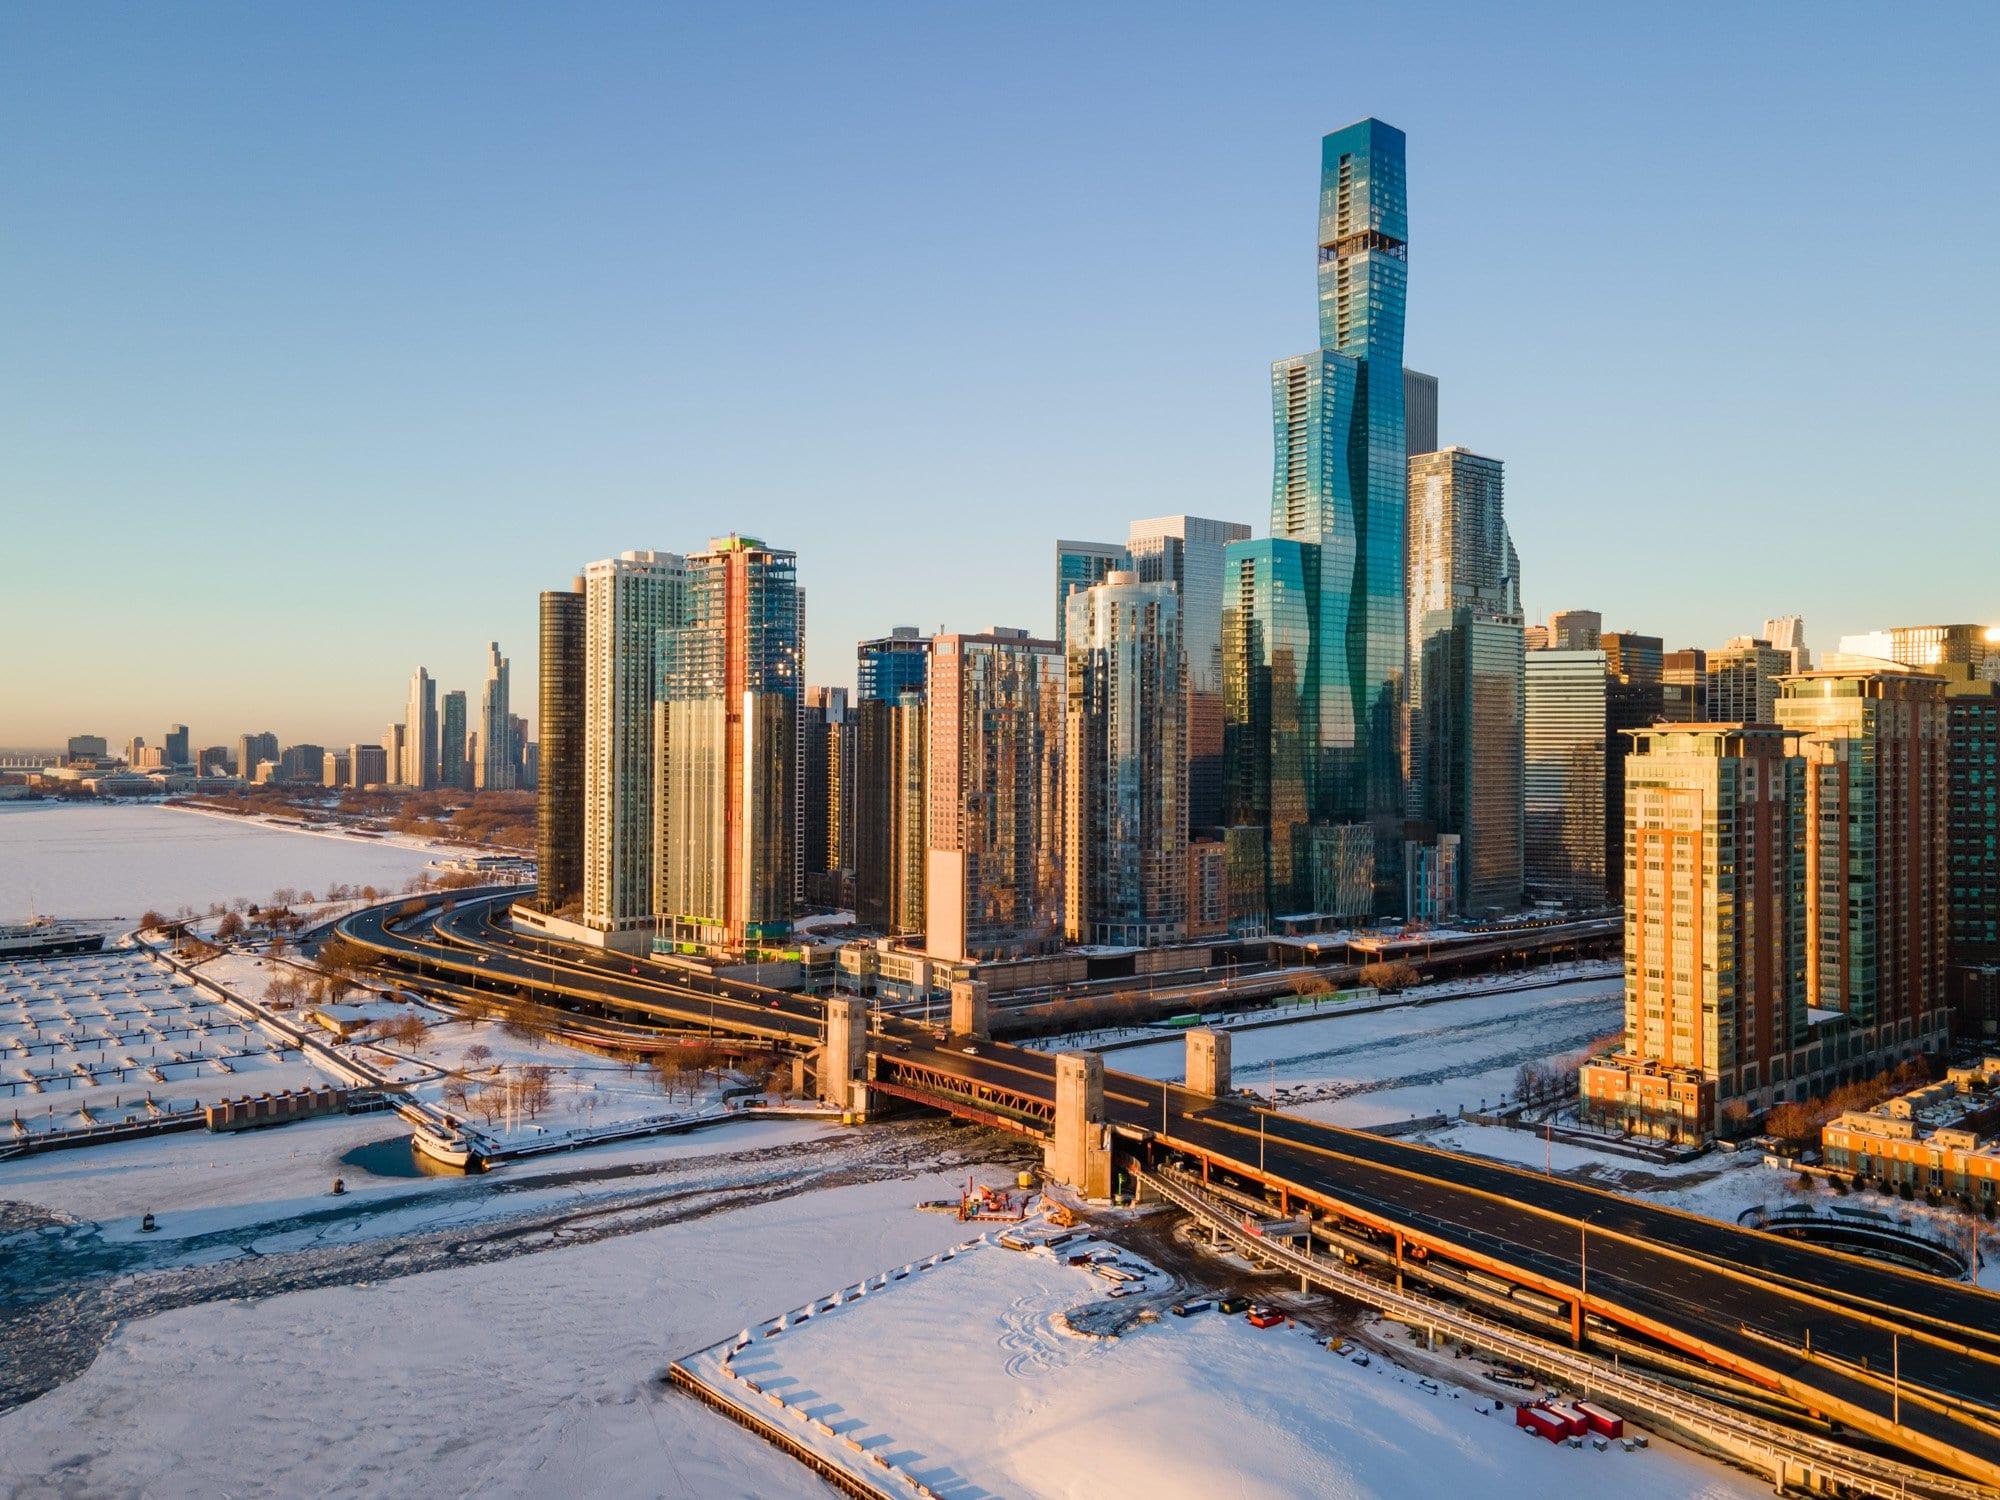 st regis chicago, magellan development, studio gang architects, drone photography, drone architecture photography